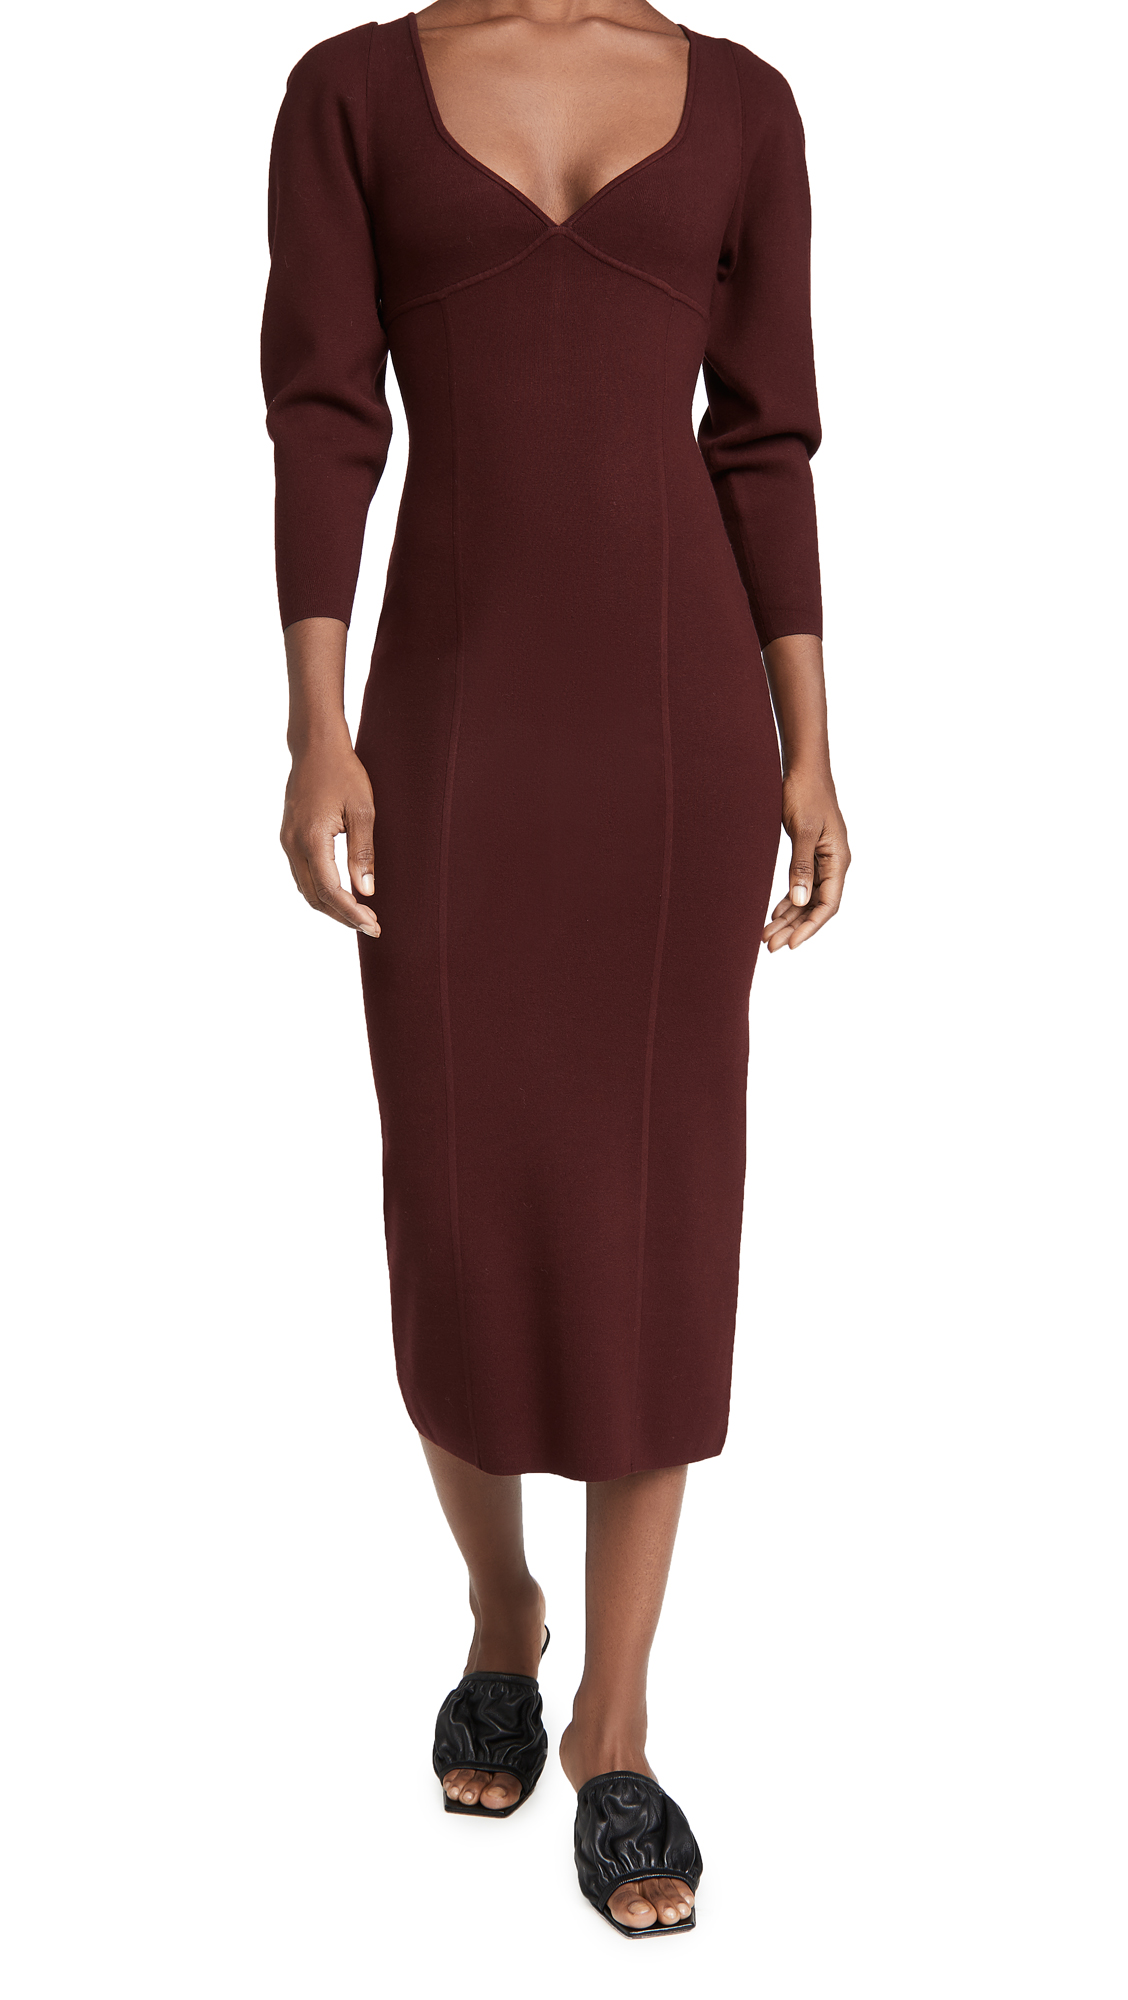 A.l.c GISELLE DRESS